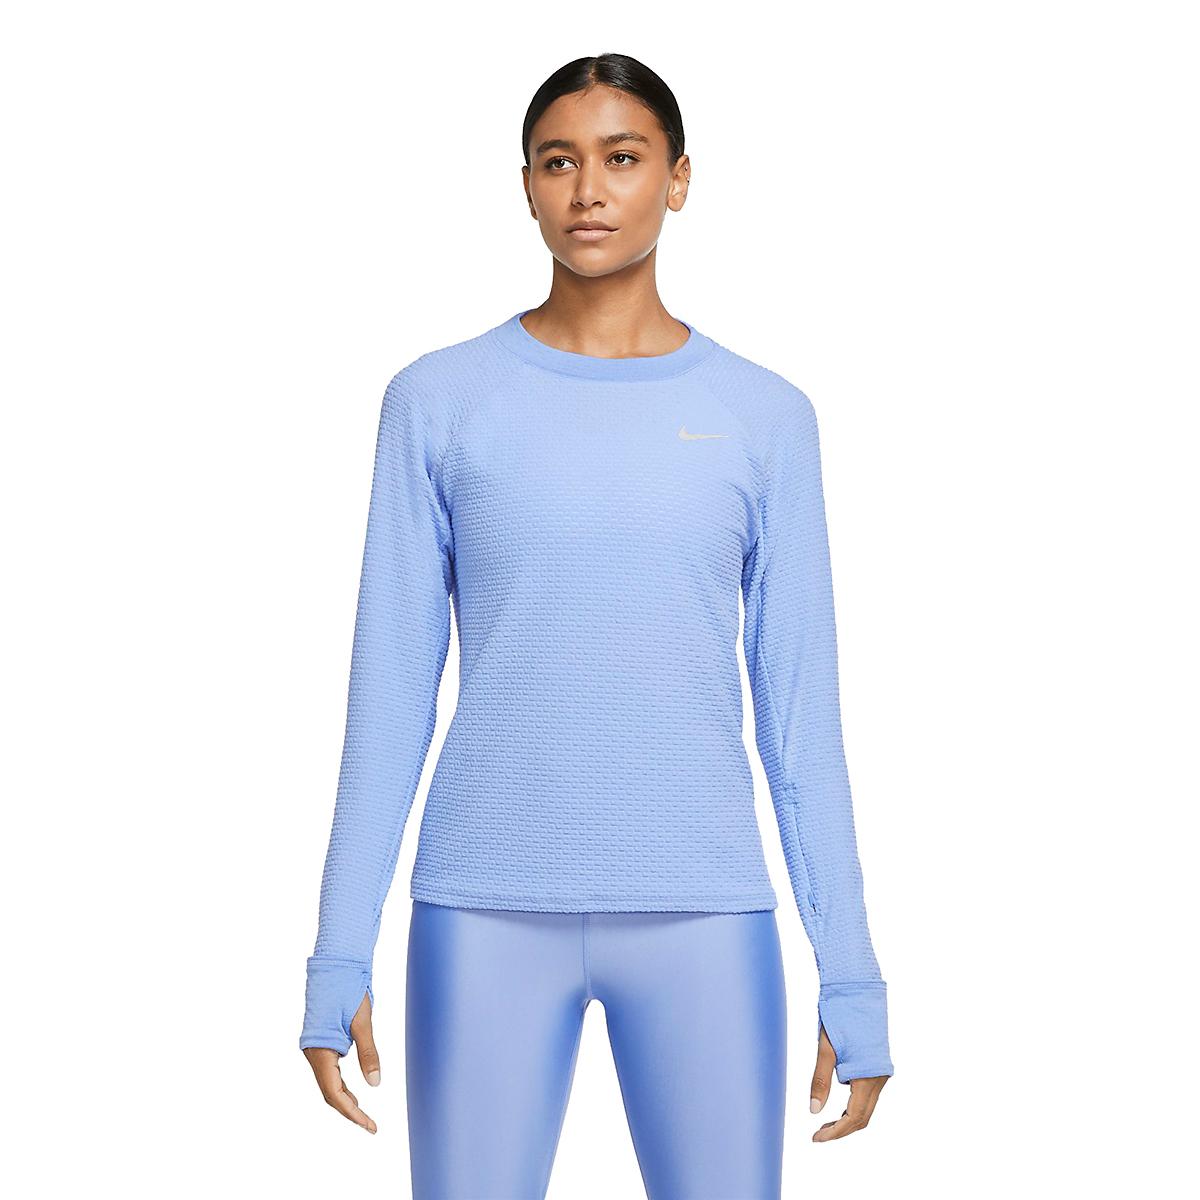 Women's Nike Sphere Crew Long Sleeve Shirt - Color: Royal Pulse/Reflective Silver - Size: XS, Royal Pulse/Reflective Silver, large, image 3